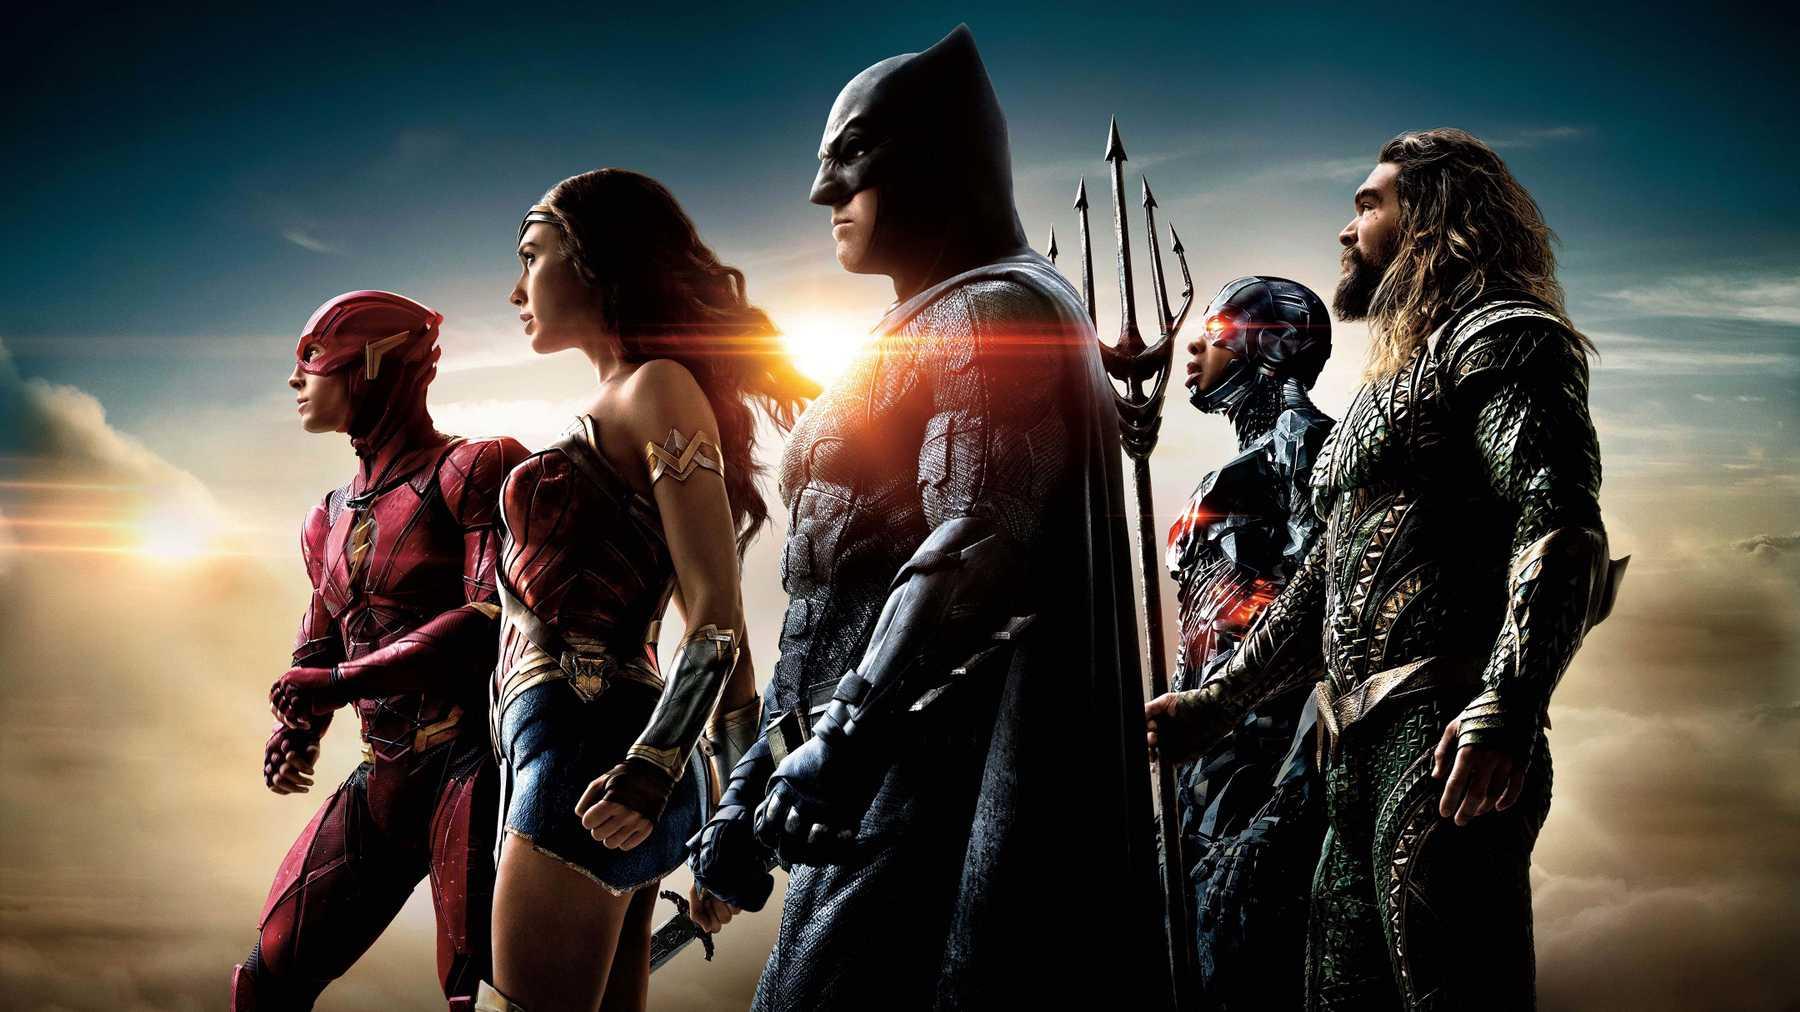 Justice-league-snyder-cut-1.jpg